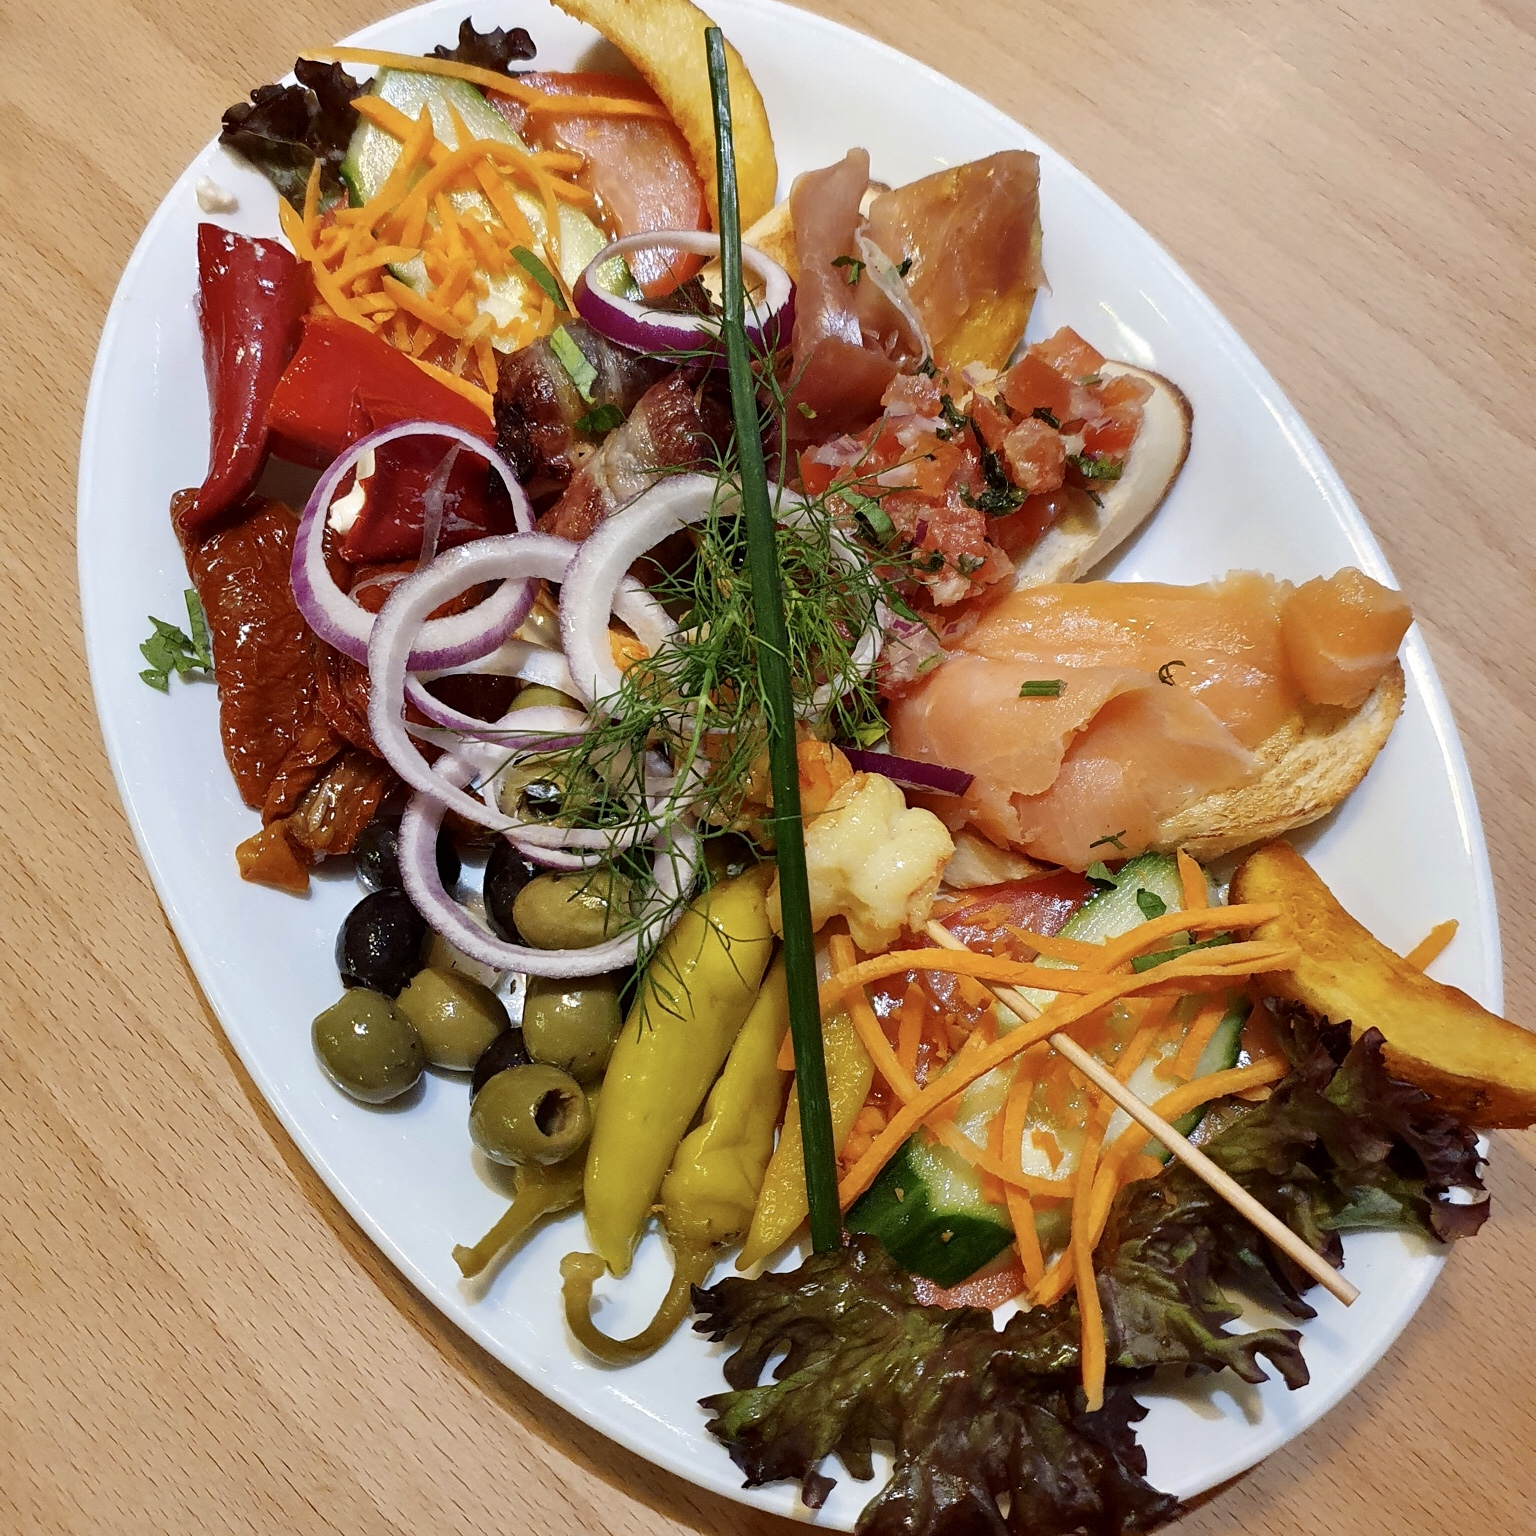 Eckstein-Restaurant-Eimsbüttel-Burger-Steaks-Fisch-Mixed Tapas